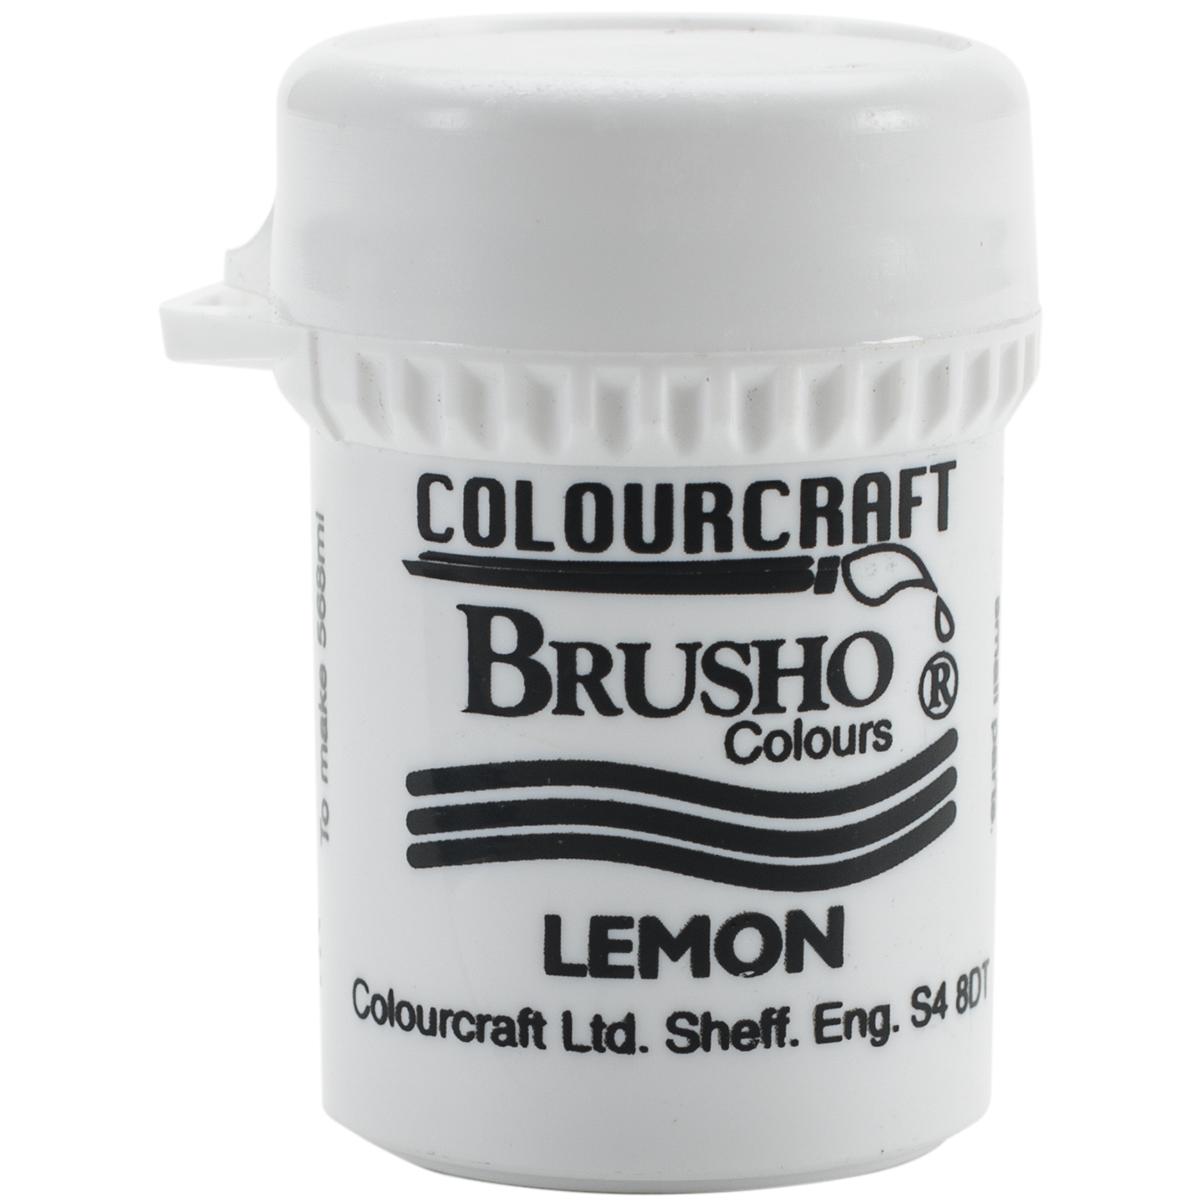 Brusho Crystal Colour 15G-Lemon - image 1 de 1